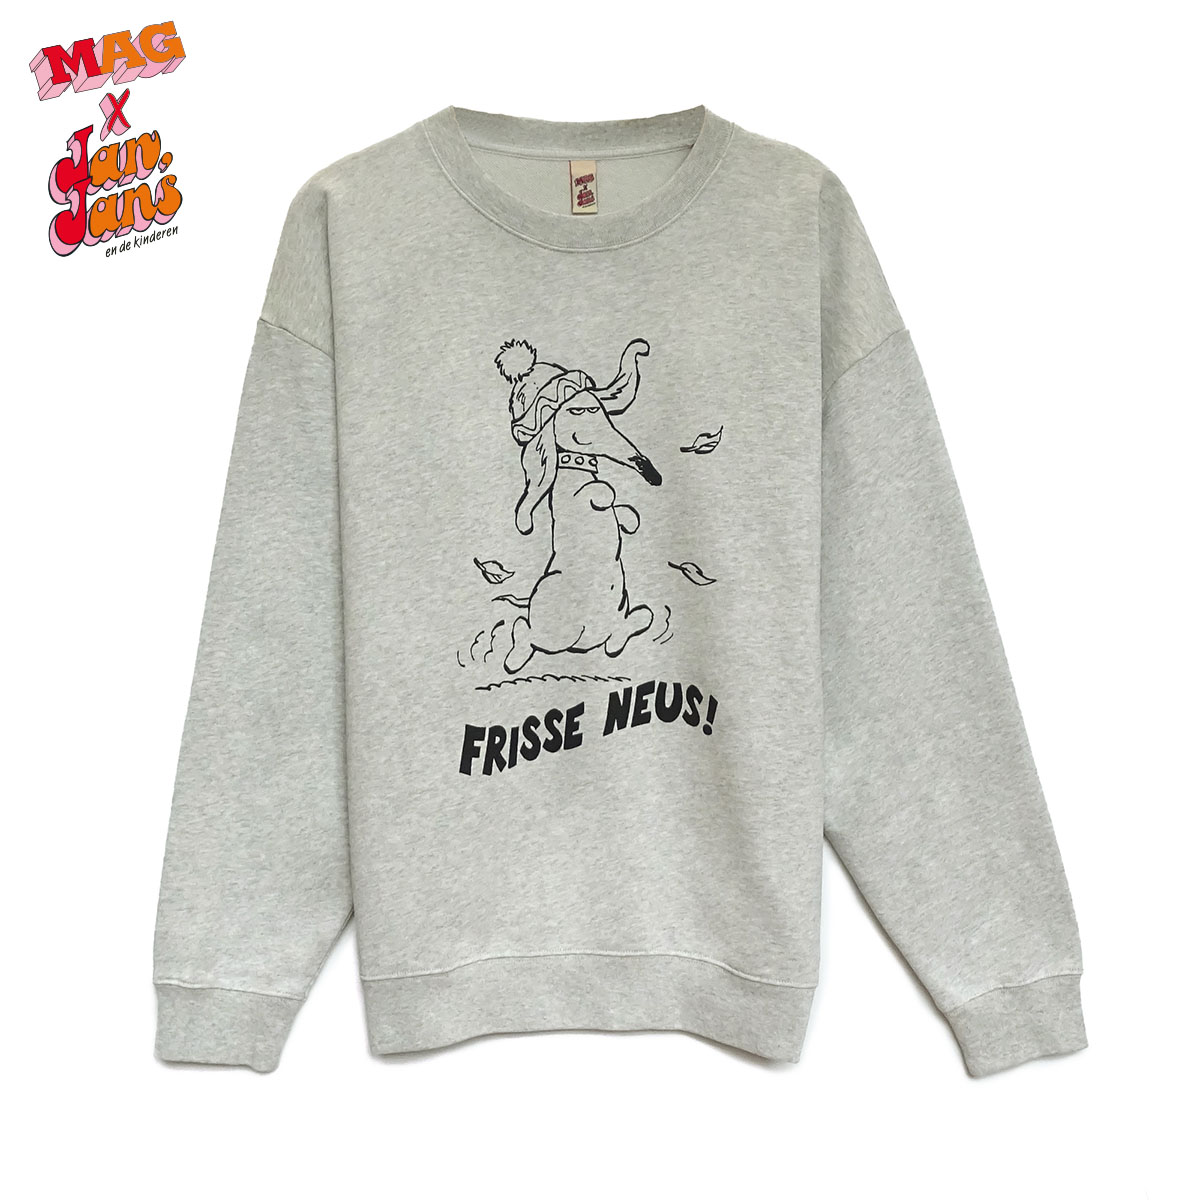 8802 Frisse Neus Light-Grey